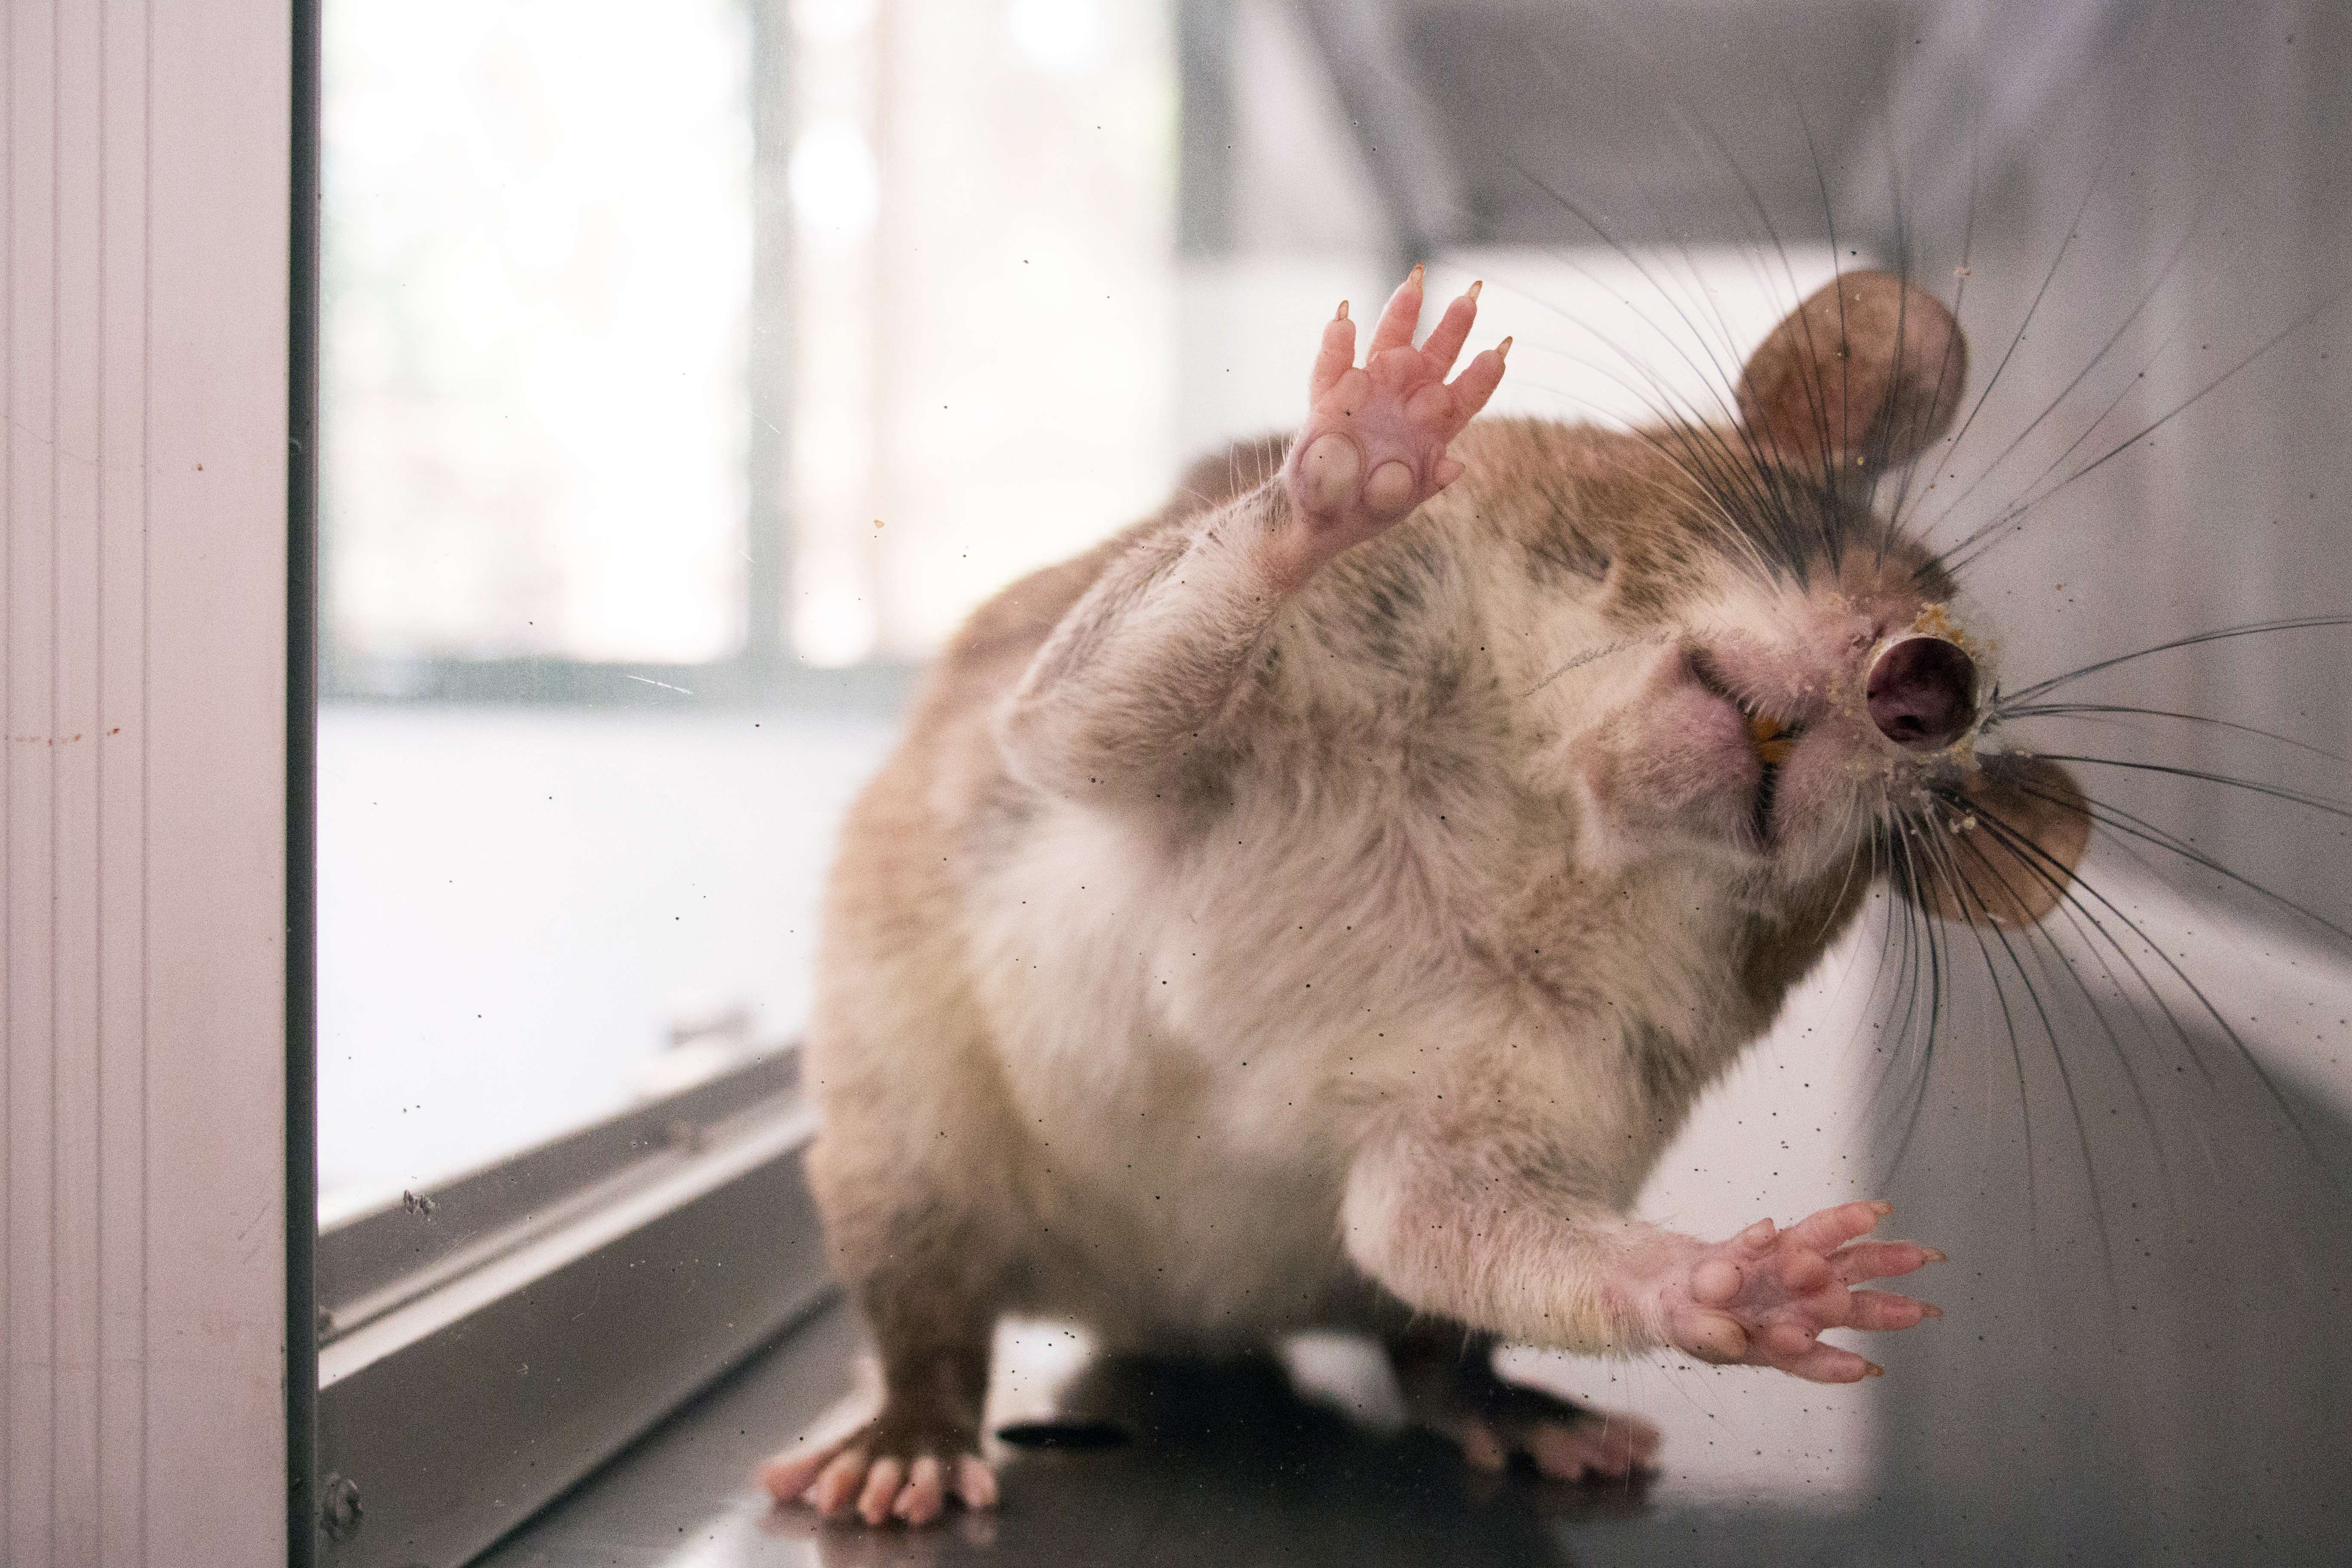 Крысы прикольные картинки, йода